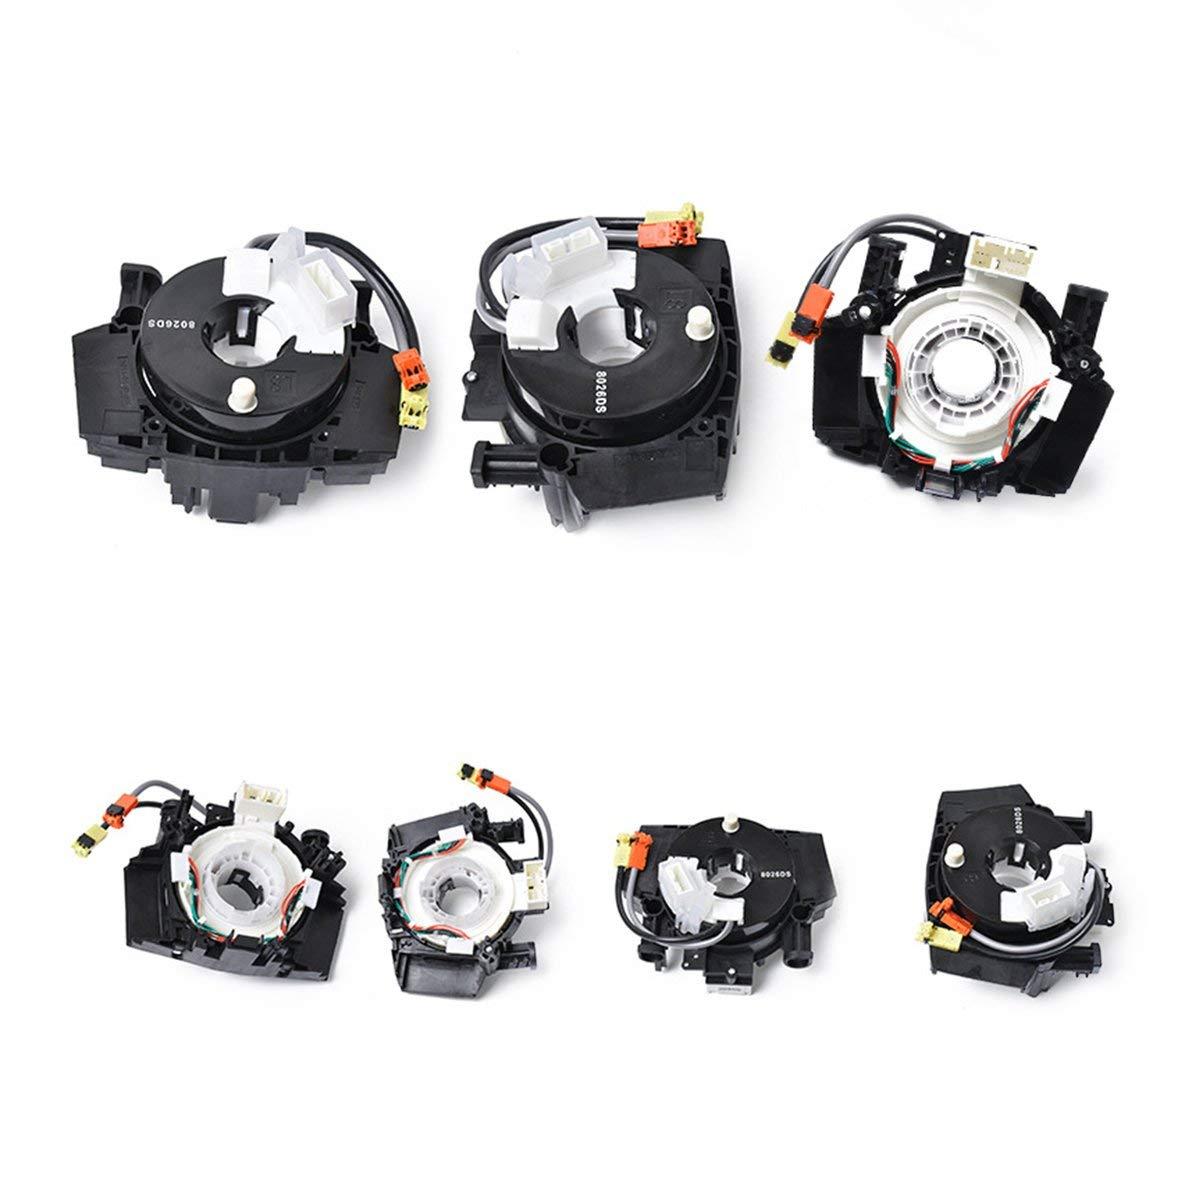 Noradtjcca Airbag Clock Spring Squib Spiral Cable Sensor Spiralkabel 25560-JD003 For Nissan Qashqai Pathfinder Murano 350Z 370Z